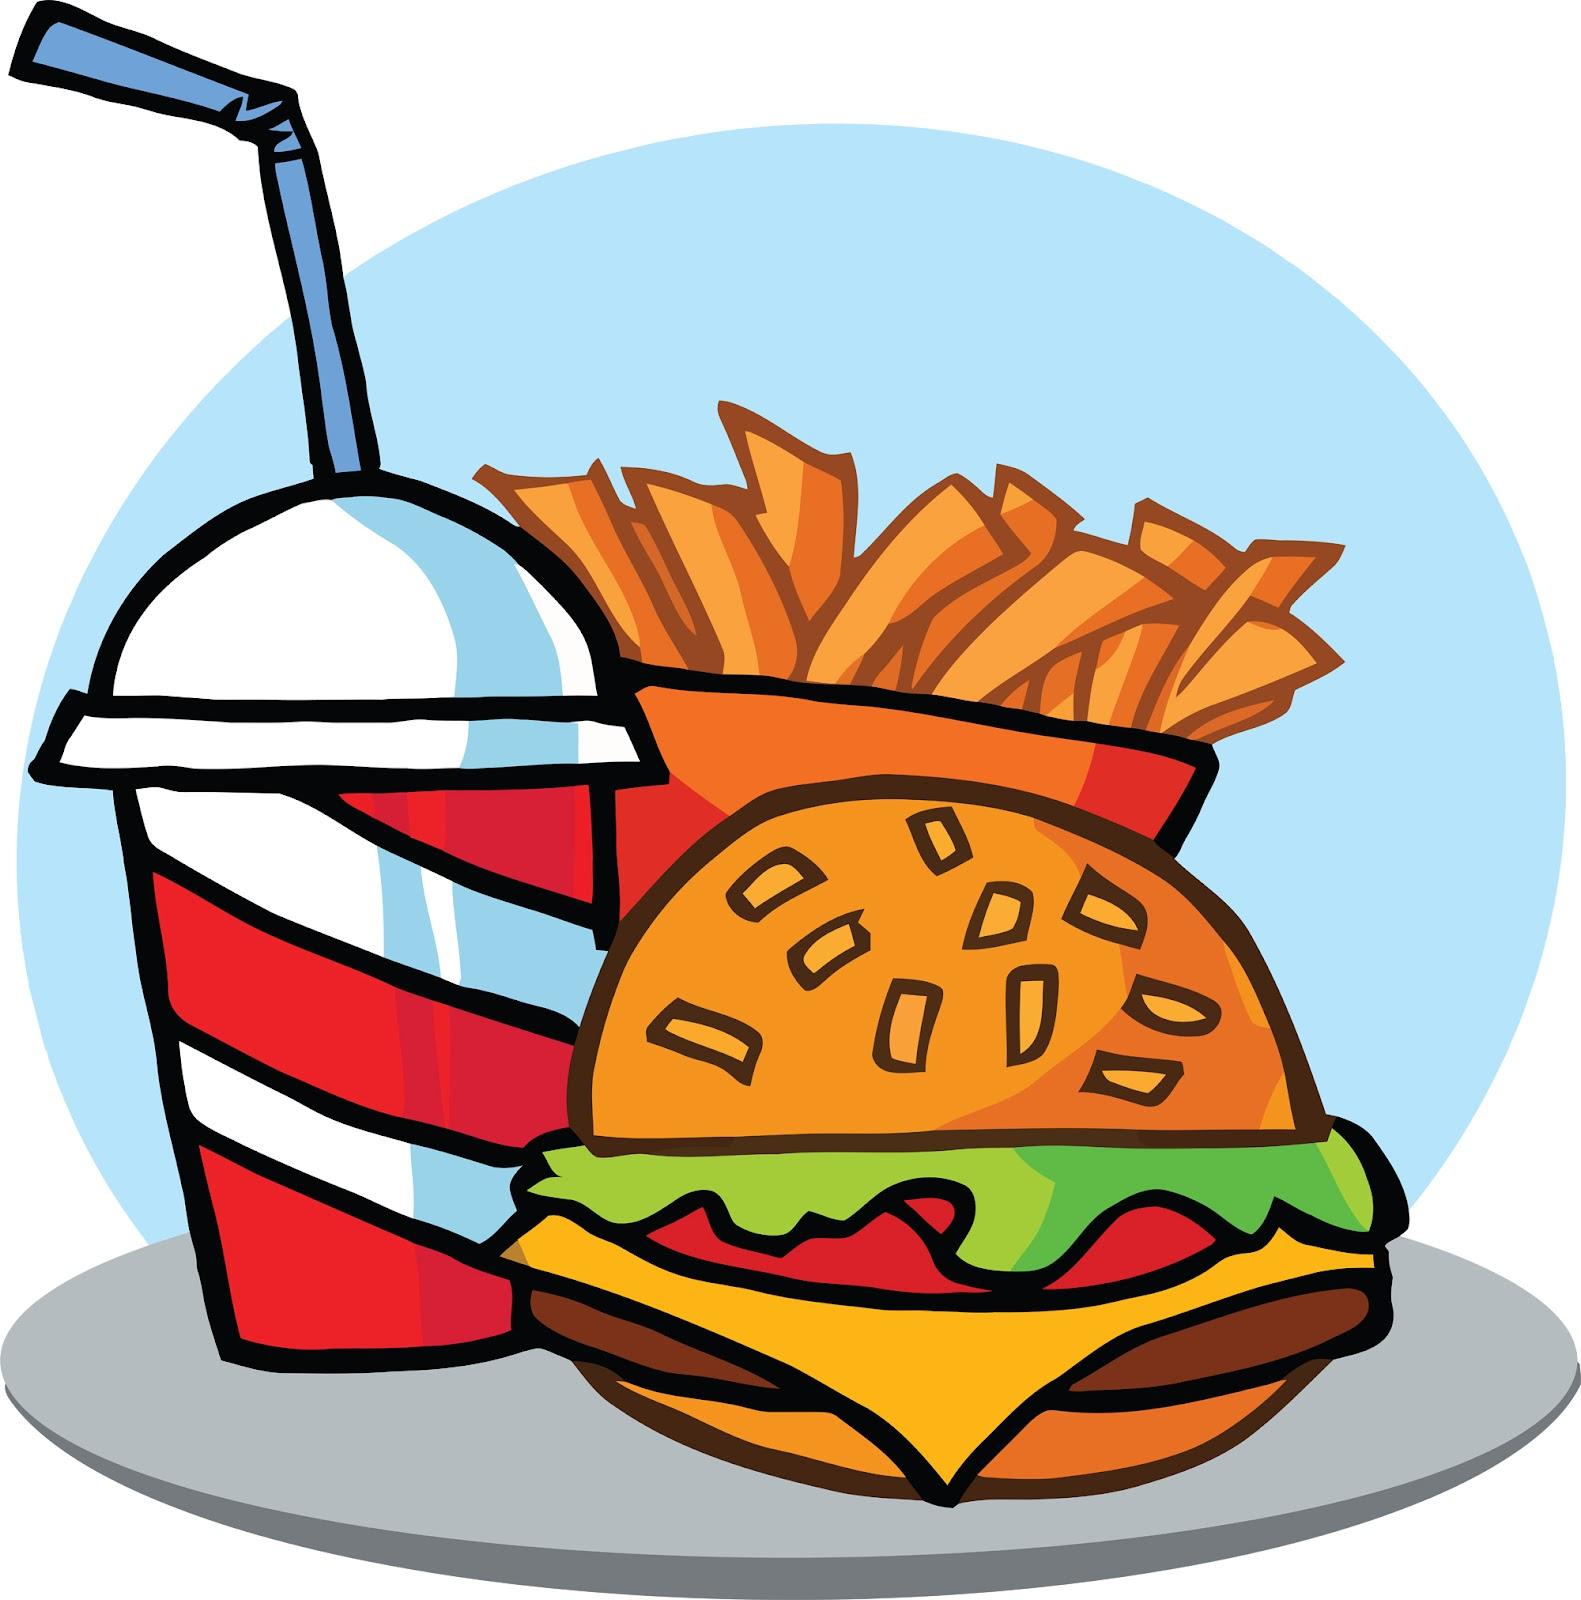 kids burger.jpg